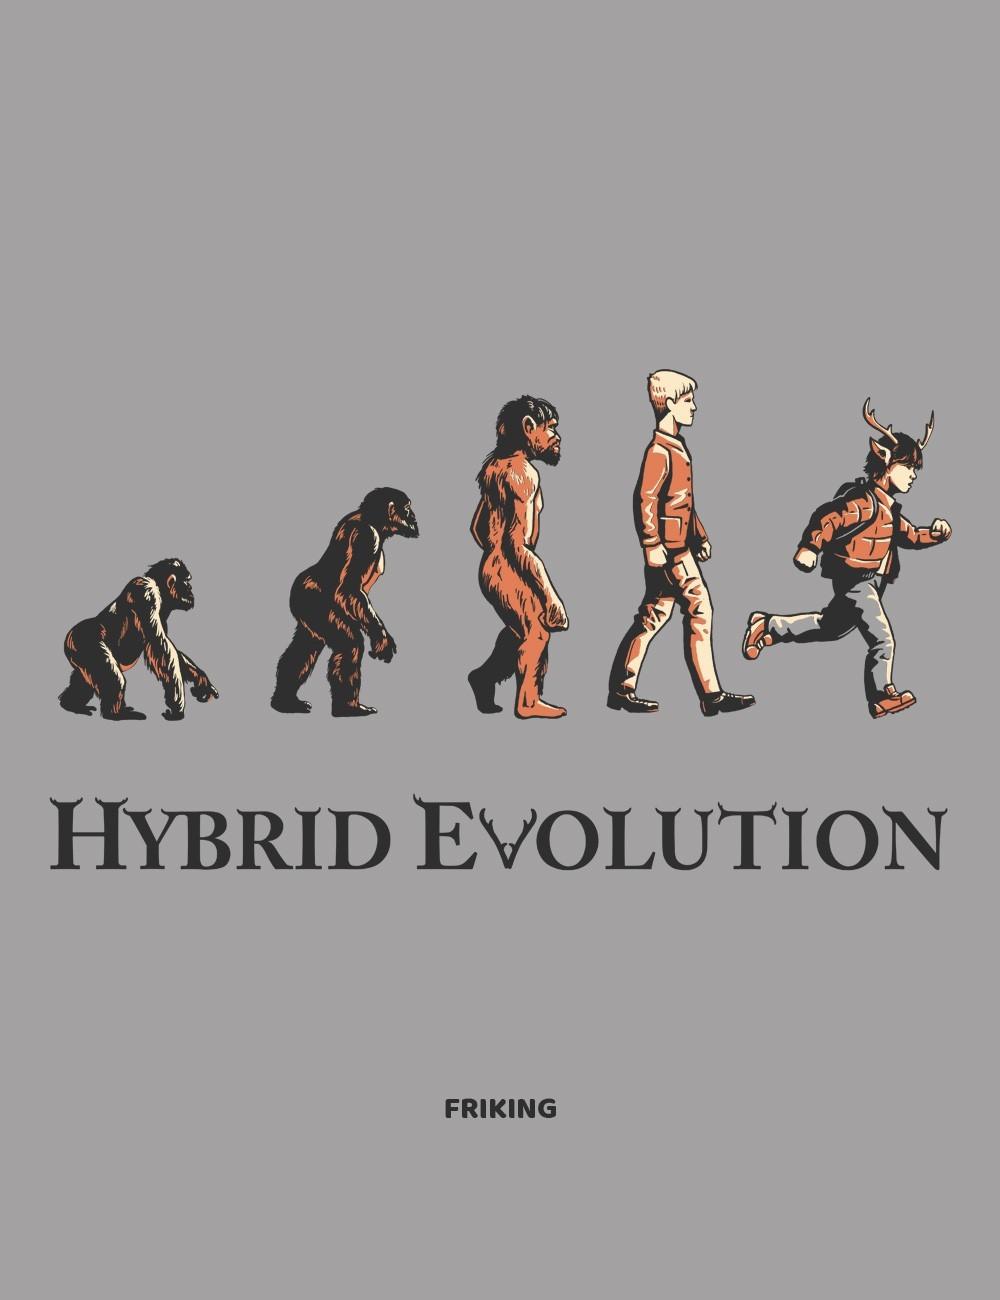 Hybrid Evolution